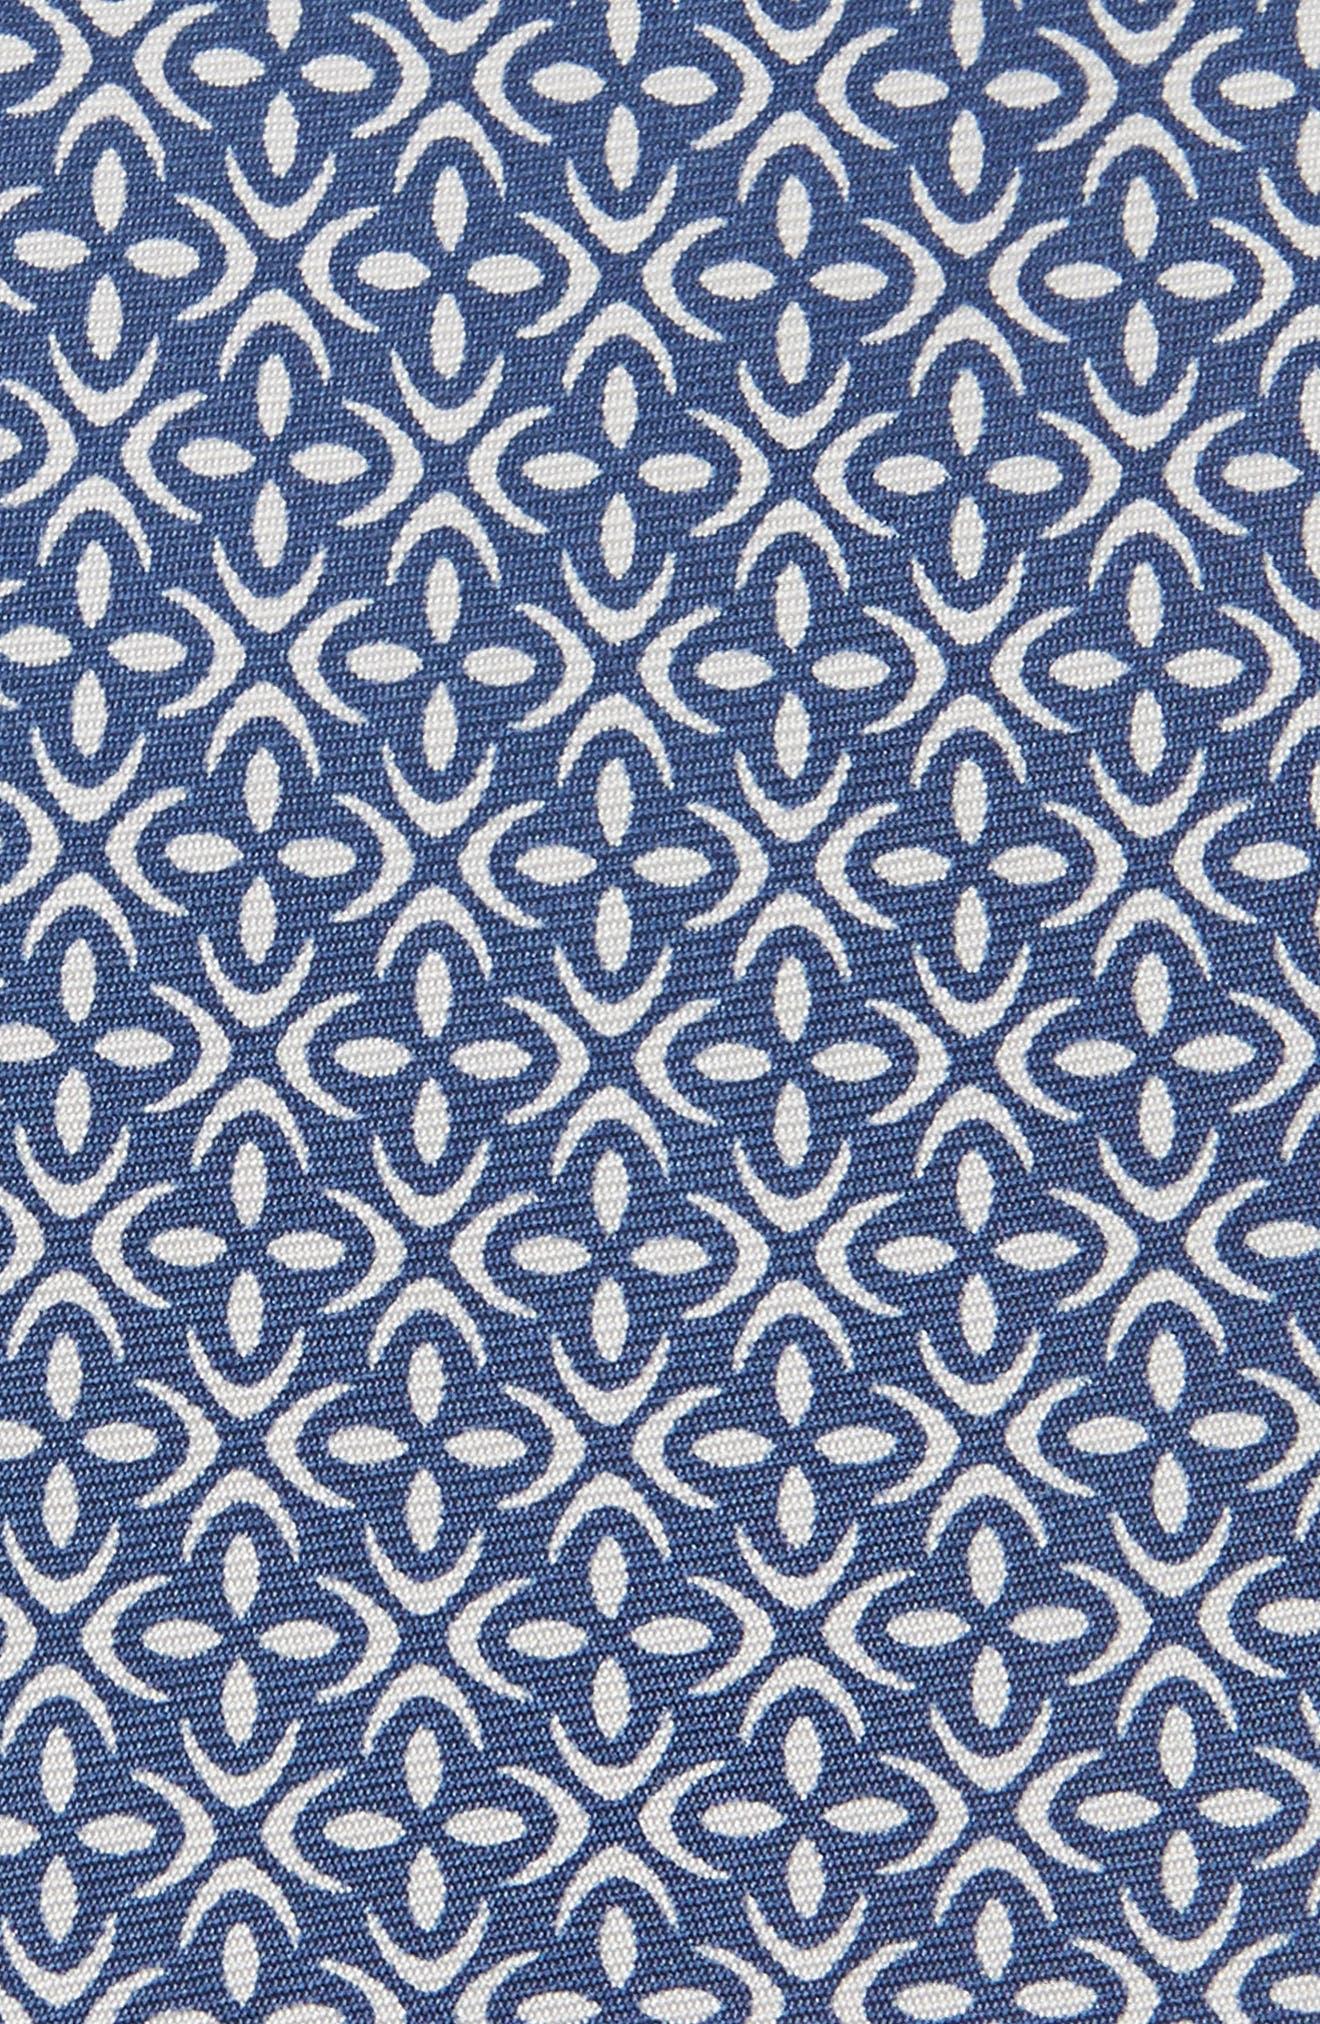 Fischer Geometric Skinny Silk Tie,                             Alternate thumbnail 2, color,                             Blue